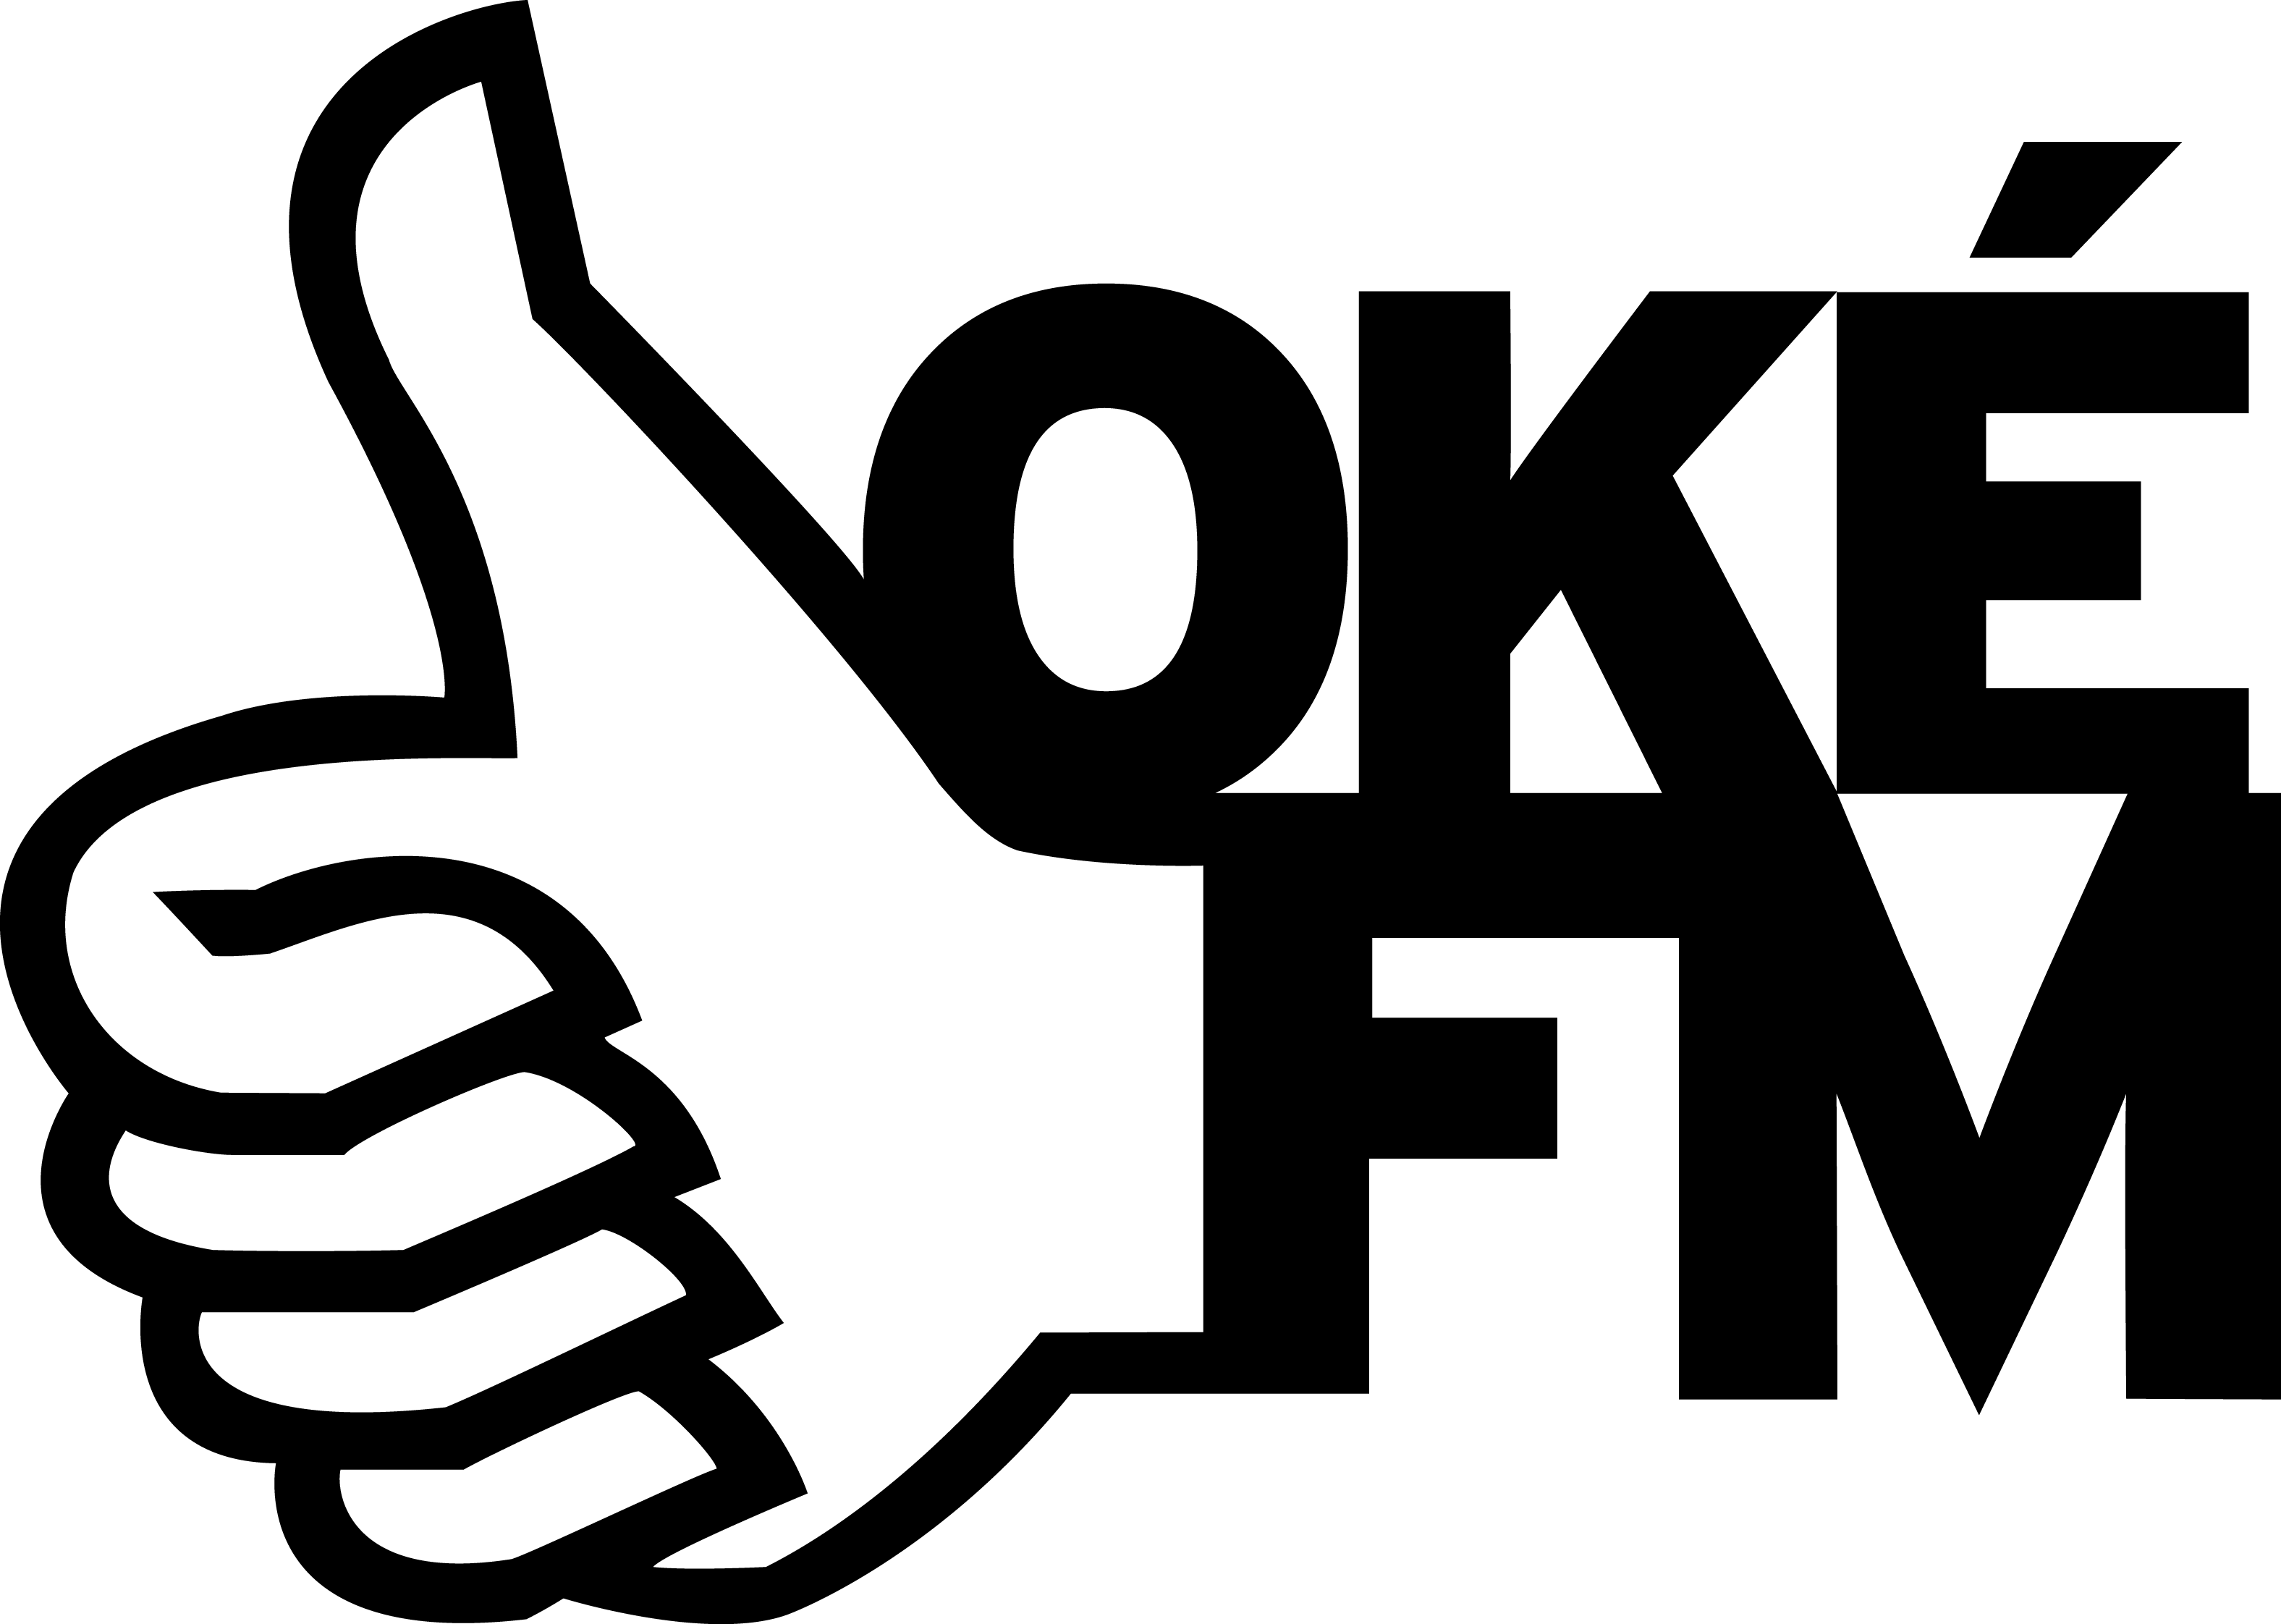 logo ok overgetekend